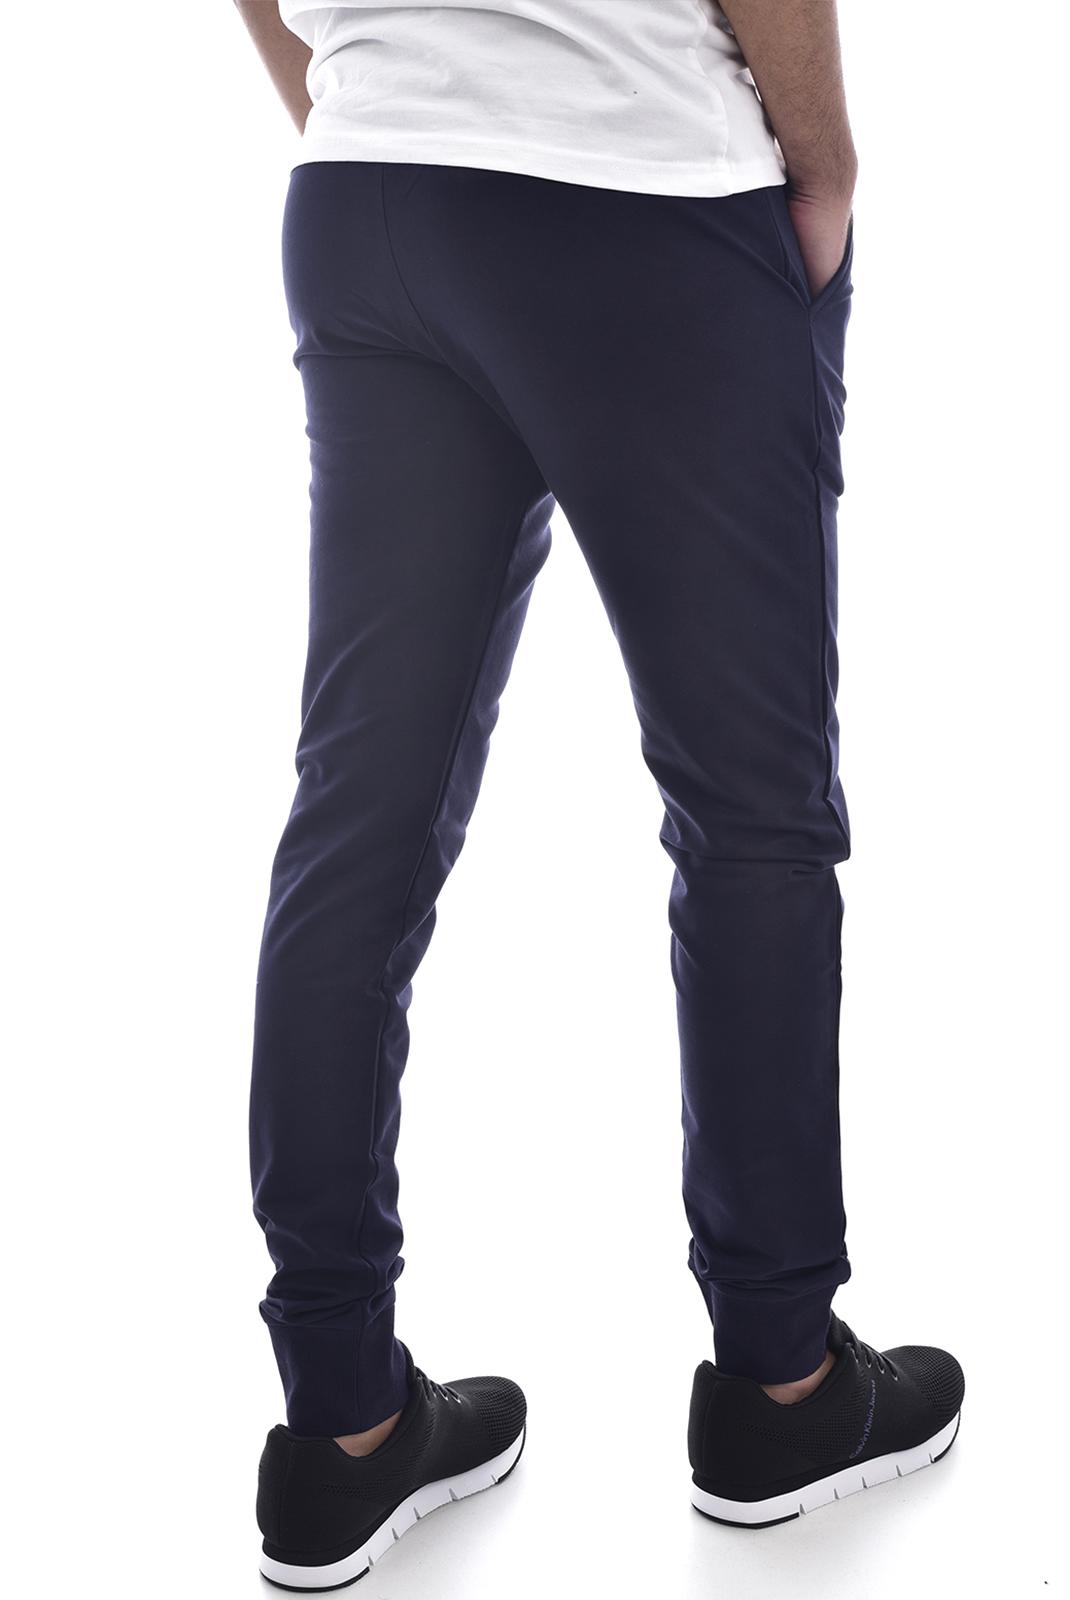 Pantalons sport/streetwear  V1969 by Versace 1969 orosei jog MARINE